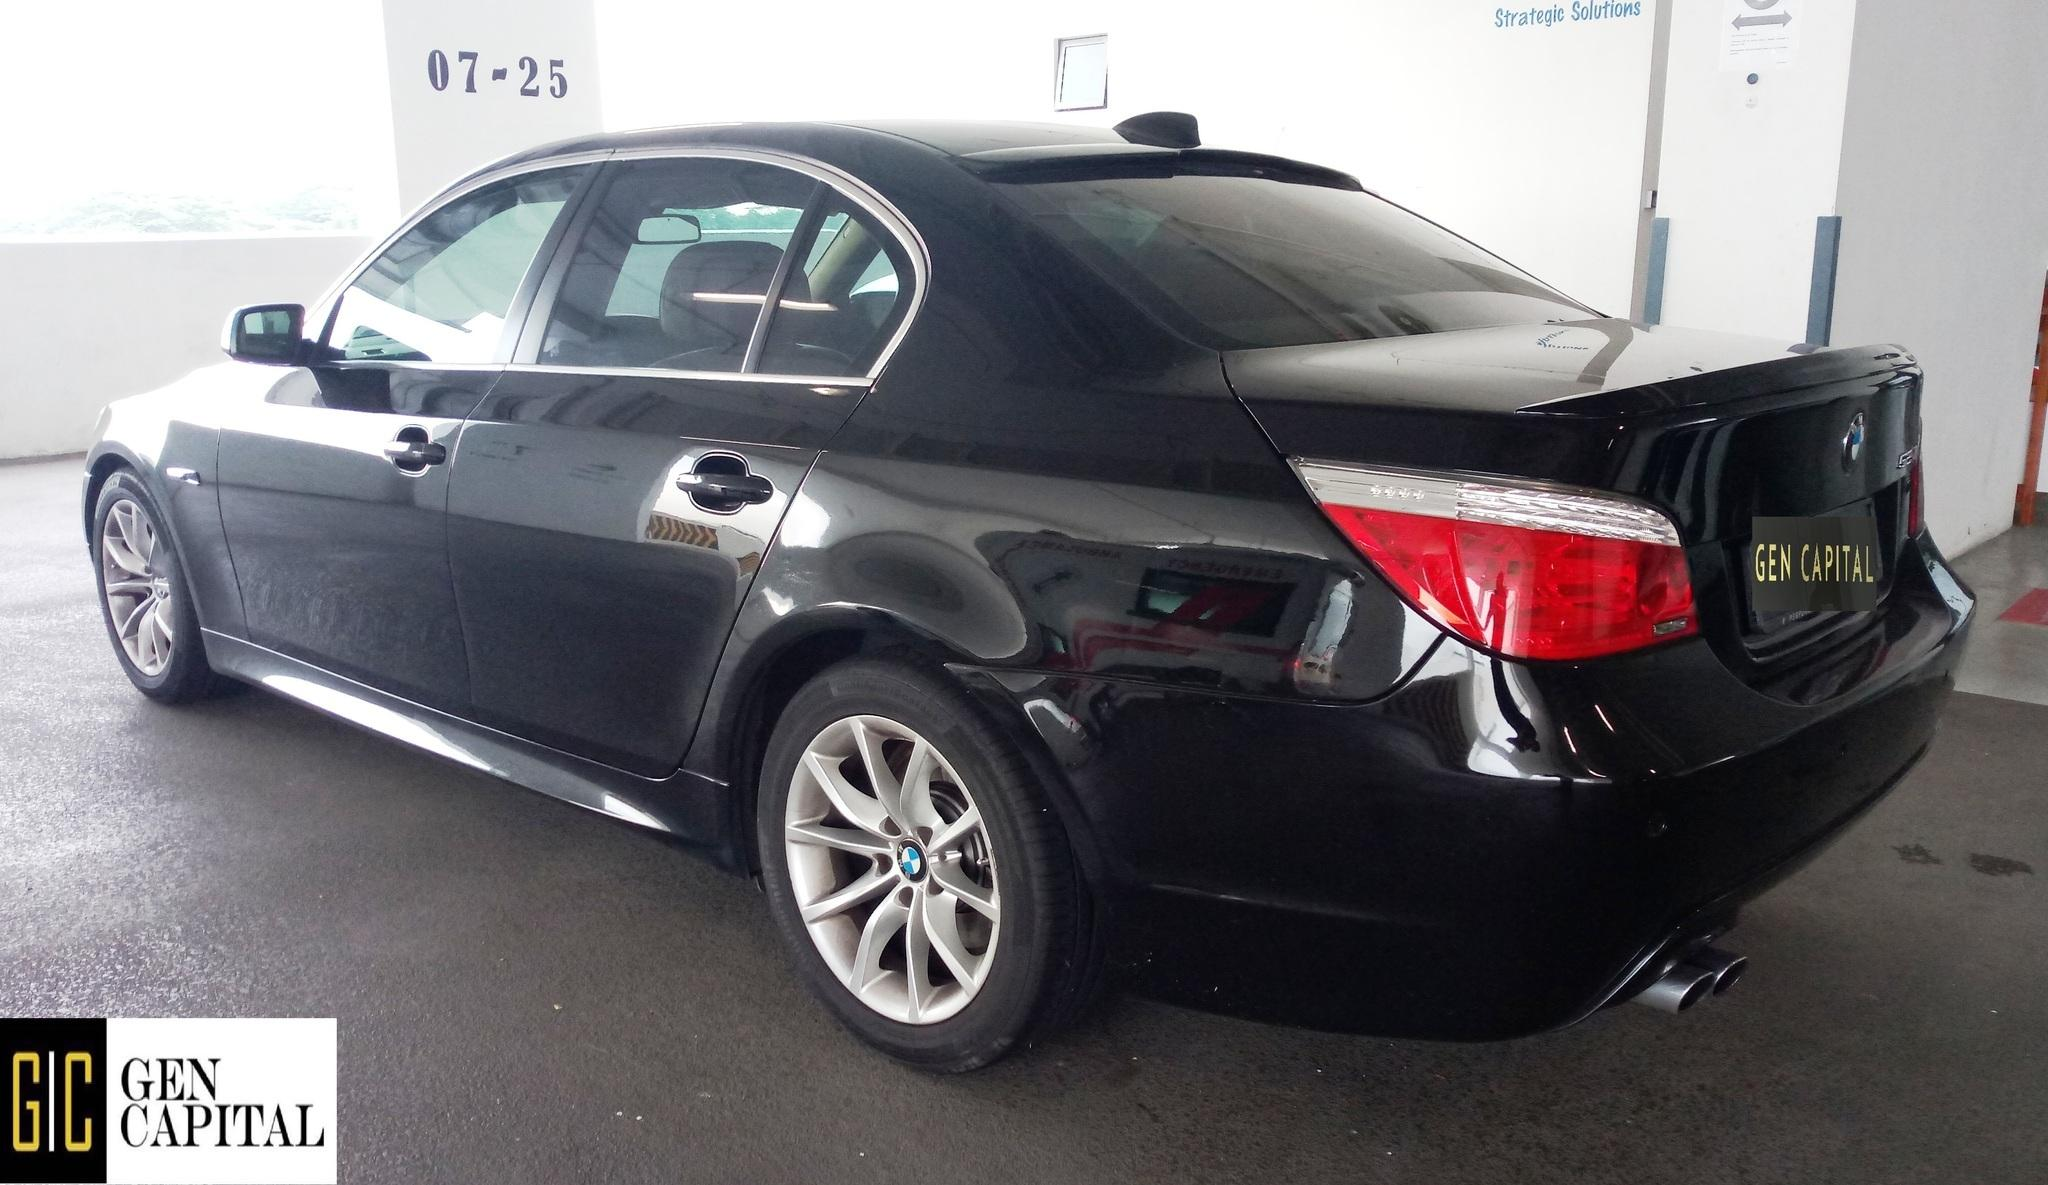 BMW 525i XL Grab Gojek Ryde Tada & Non PHV Car Rental